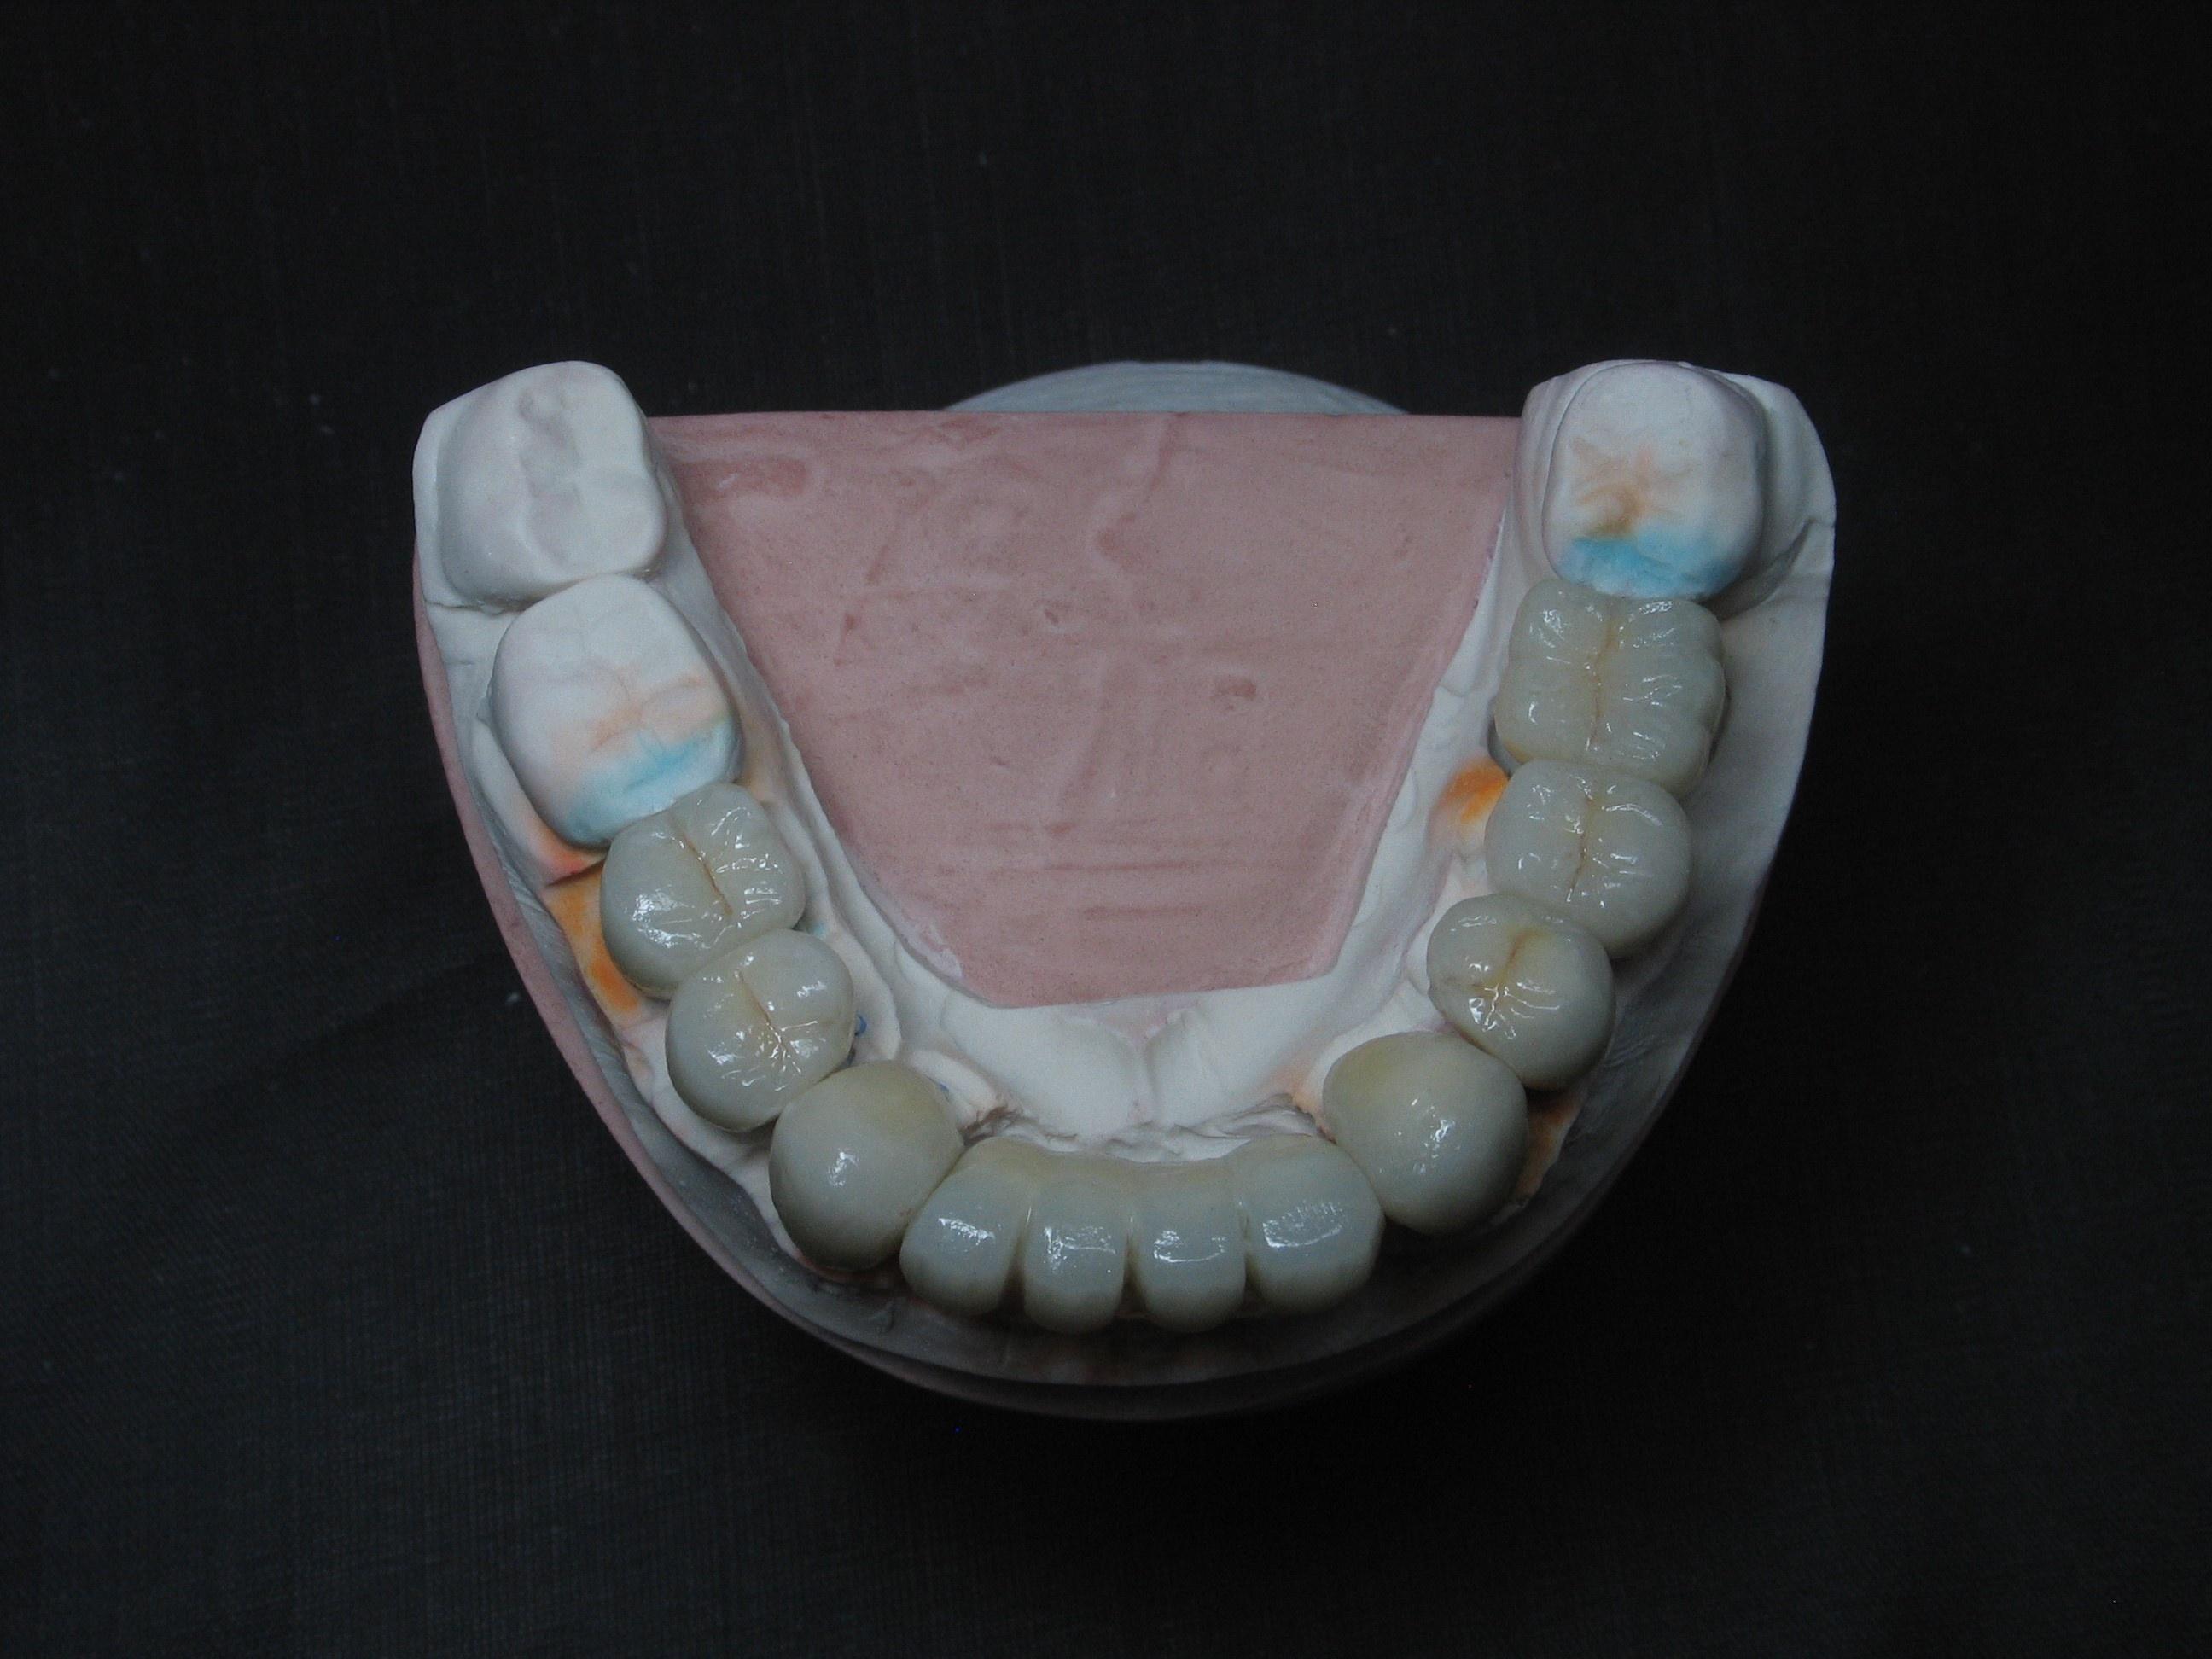 https://0201.nccdn.net/1_2/000/000/0db/350/Mold_with_Implant-4-2592x1944.jpg